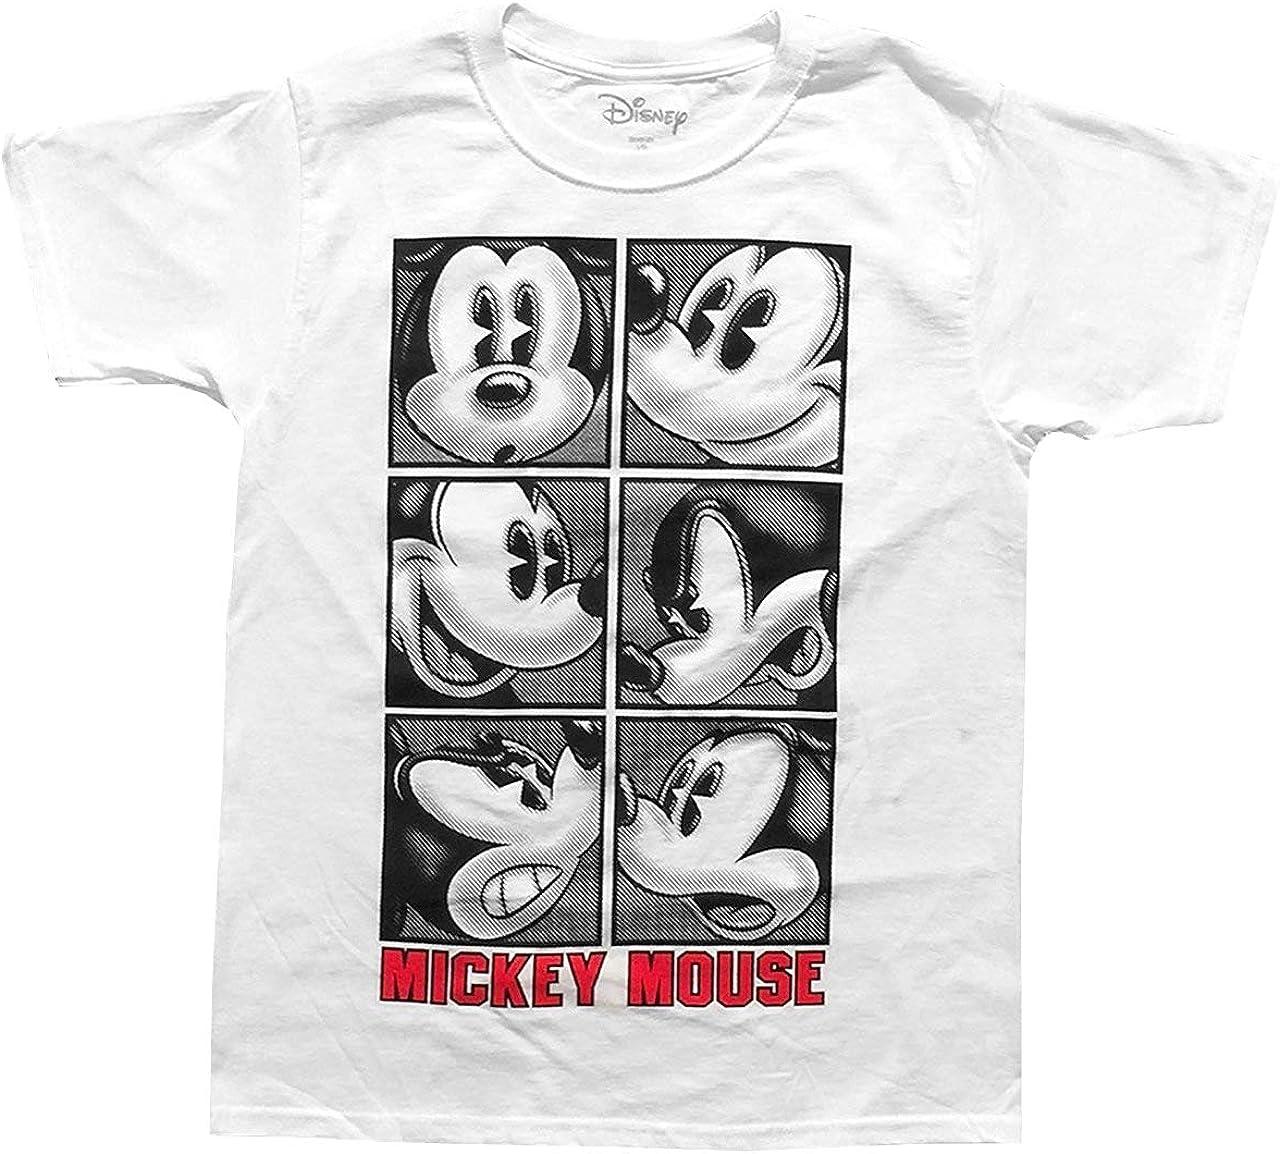 Disney Mickey Mouse Tee Attitude Youth Boys T Shirt White